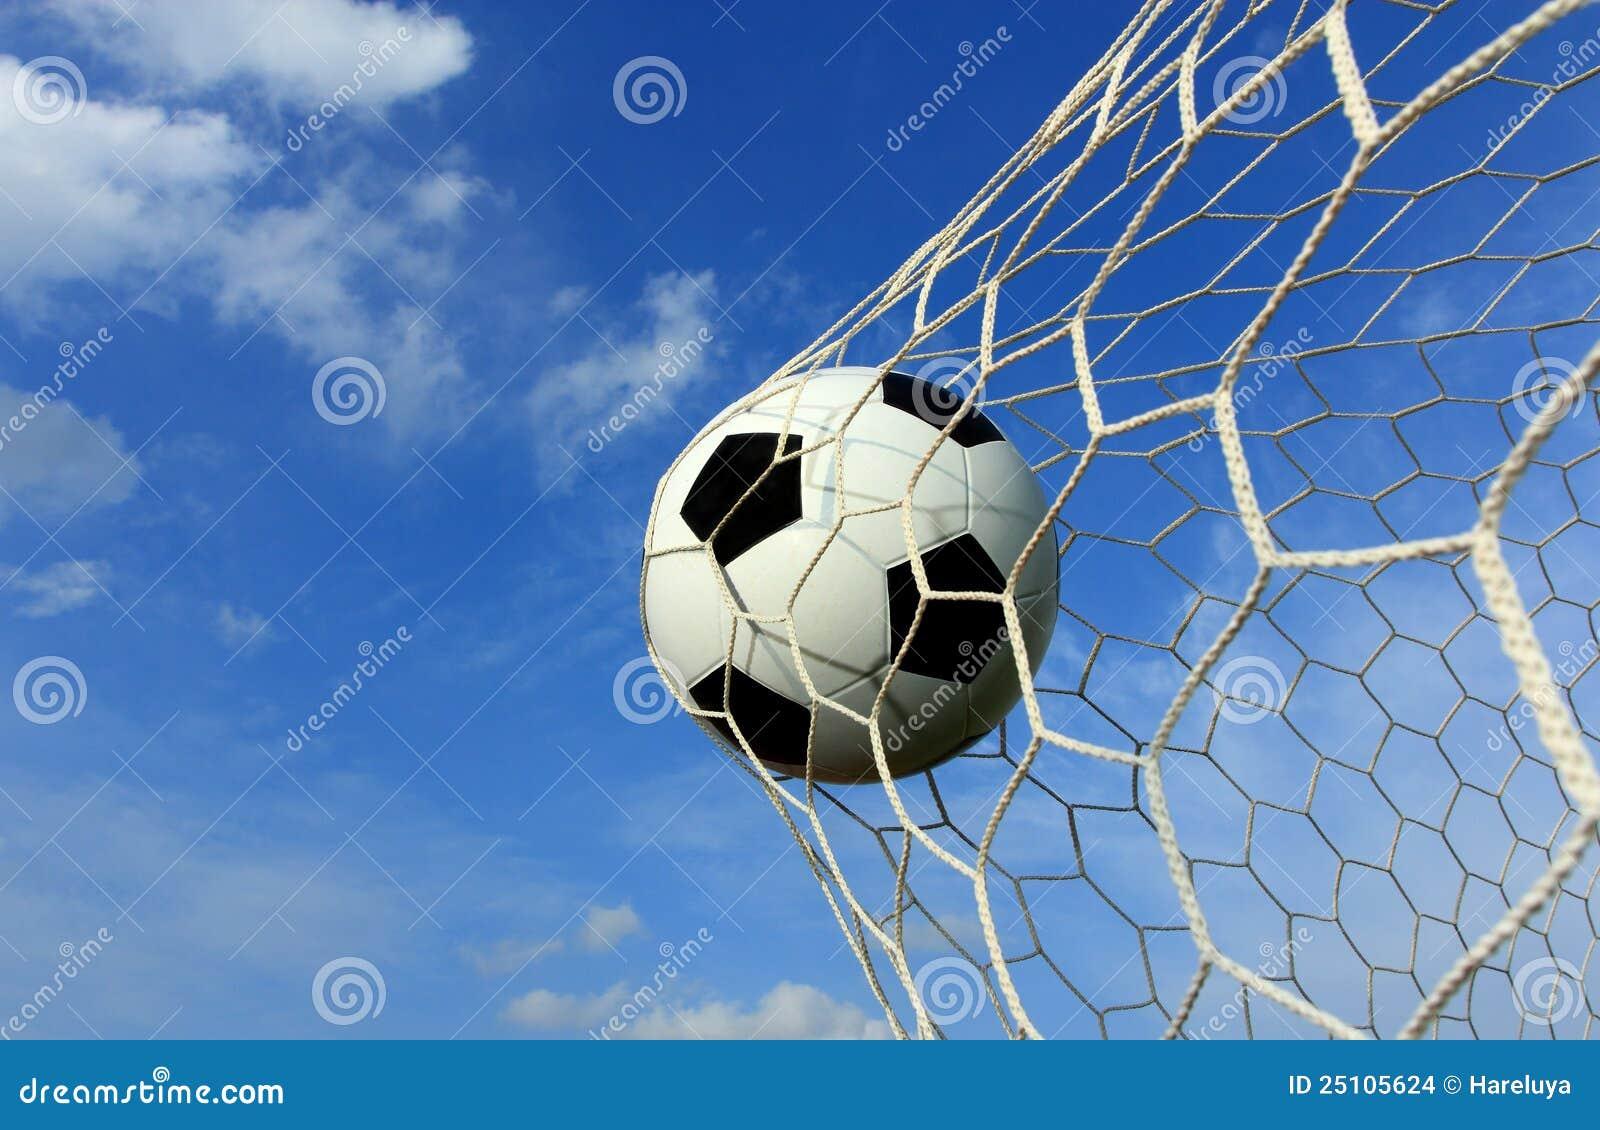 soccer ball in net stock photo image of score penalty